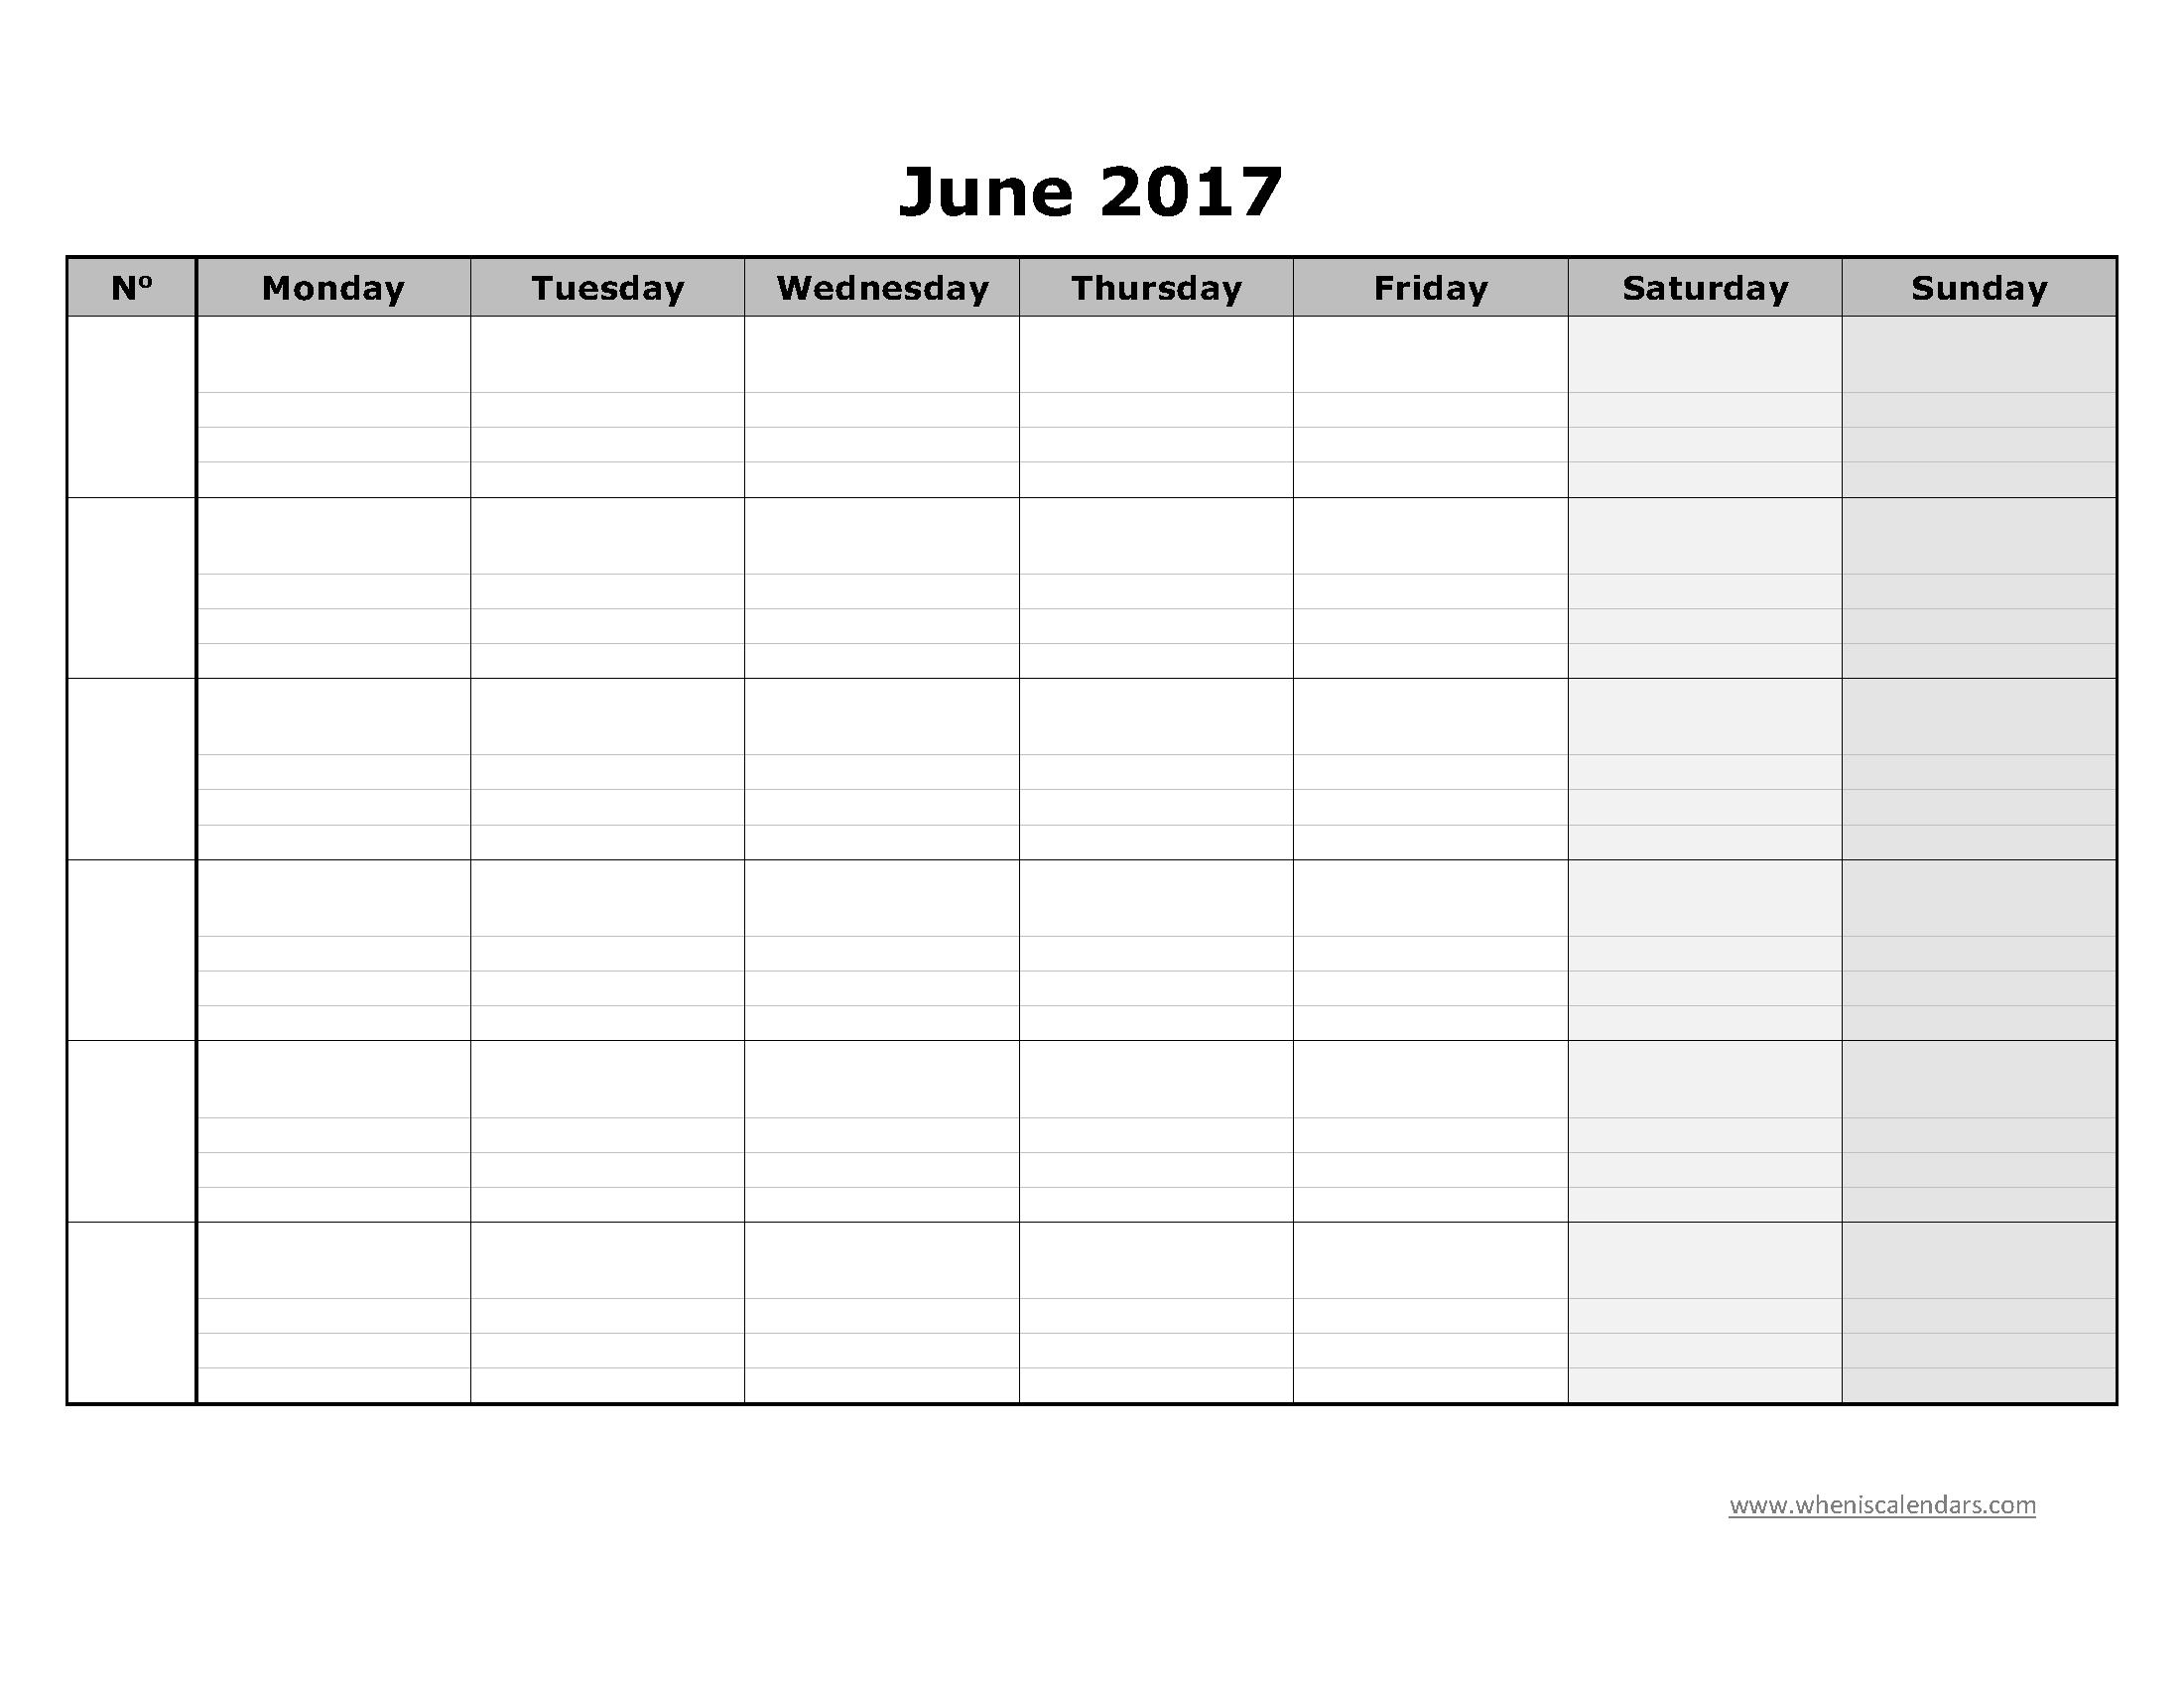 Calendar Blank June : June calendar printable holidays templates editable